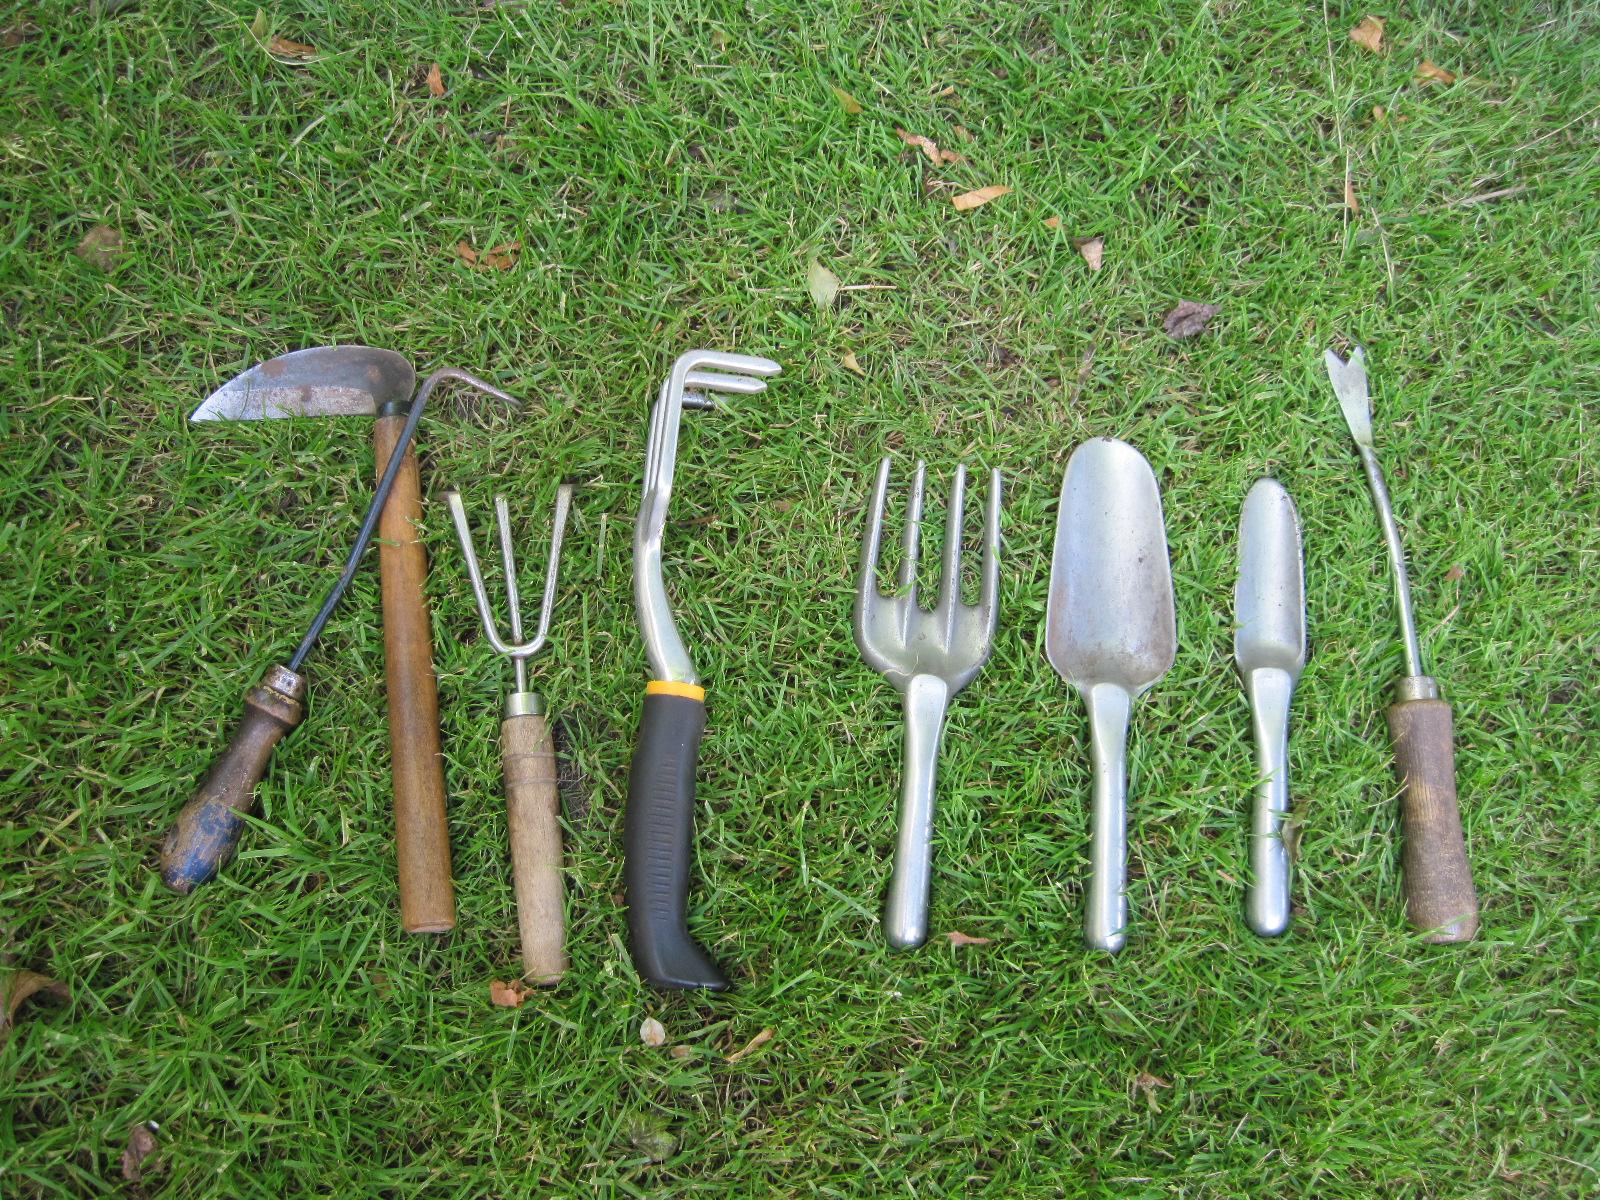 Weeding audrey driscoll 39 s blog for Lawn garden equipment